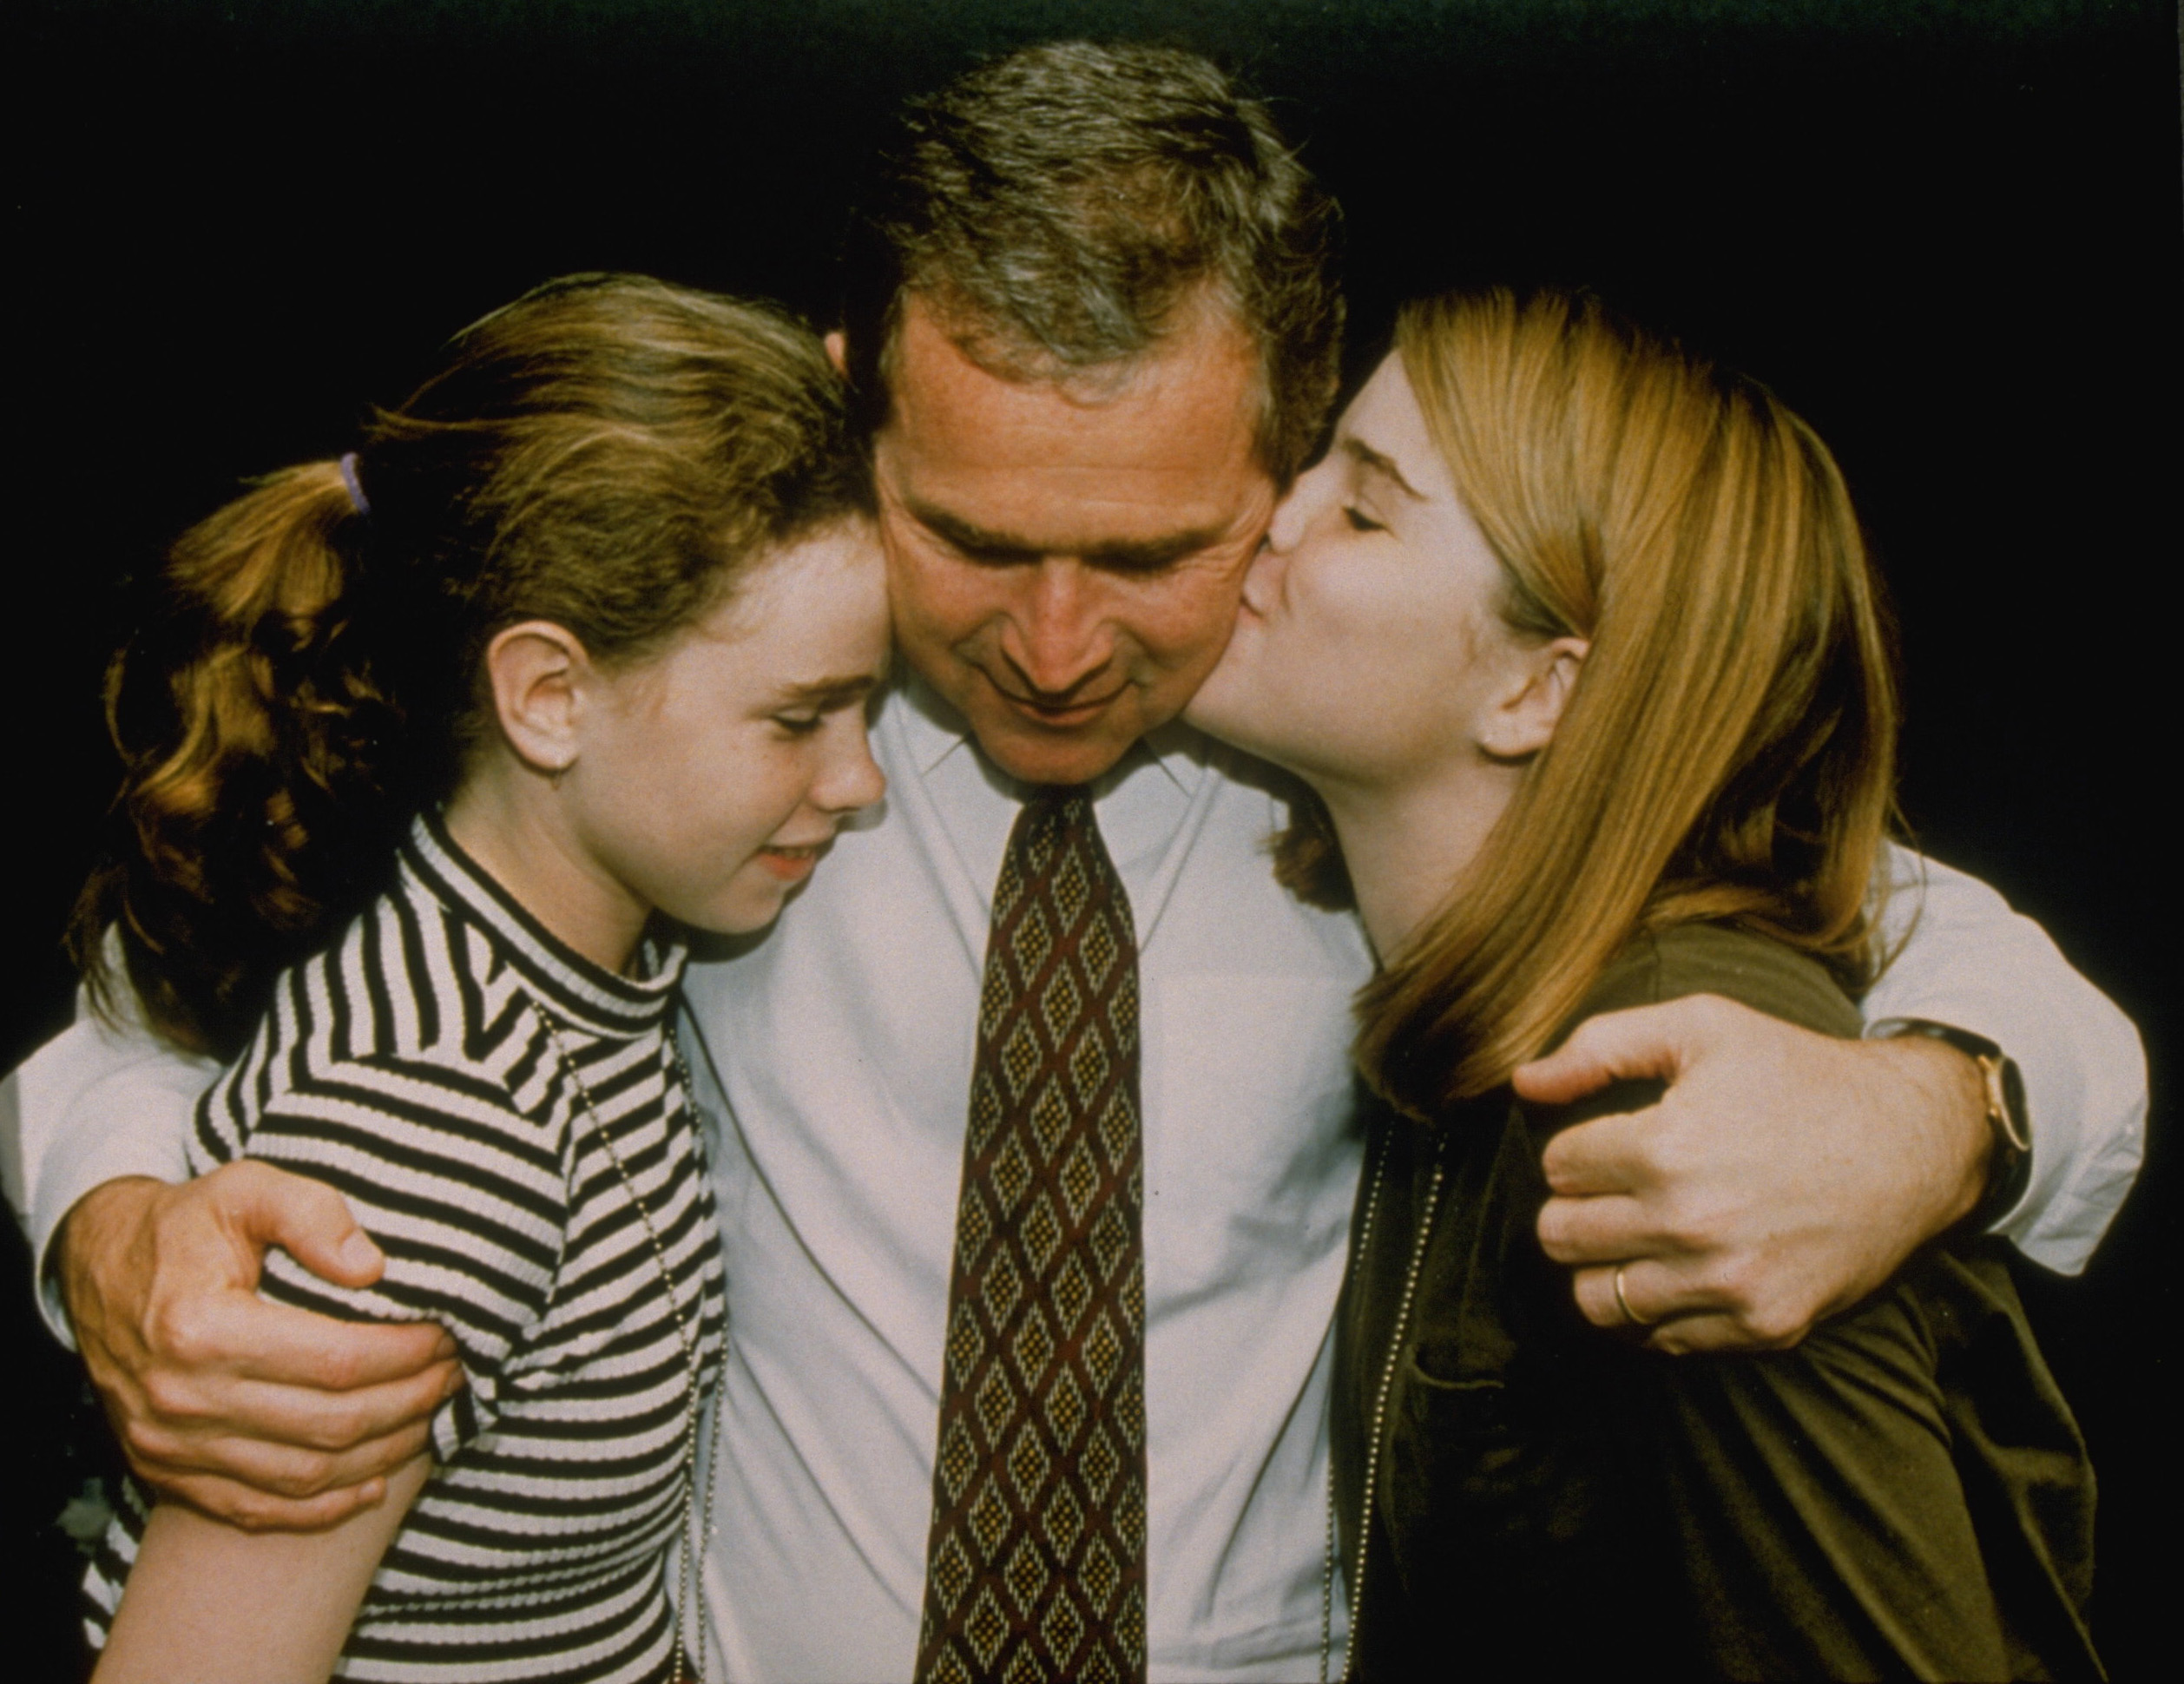 George W. Bush hugging his daughters Barbara and Jenna.